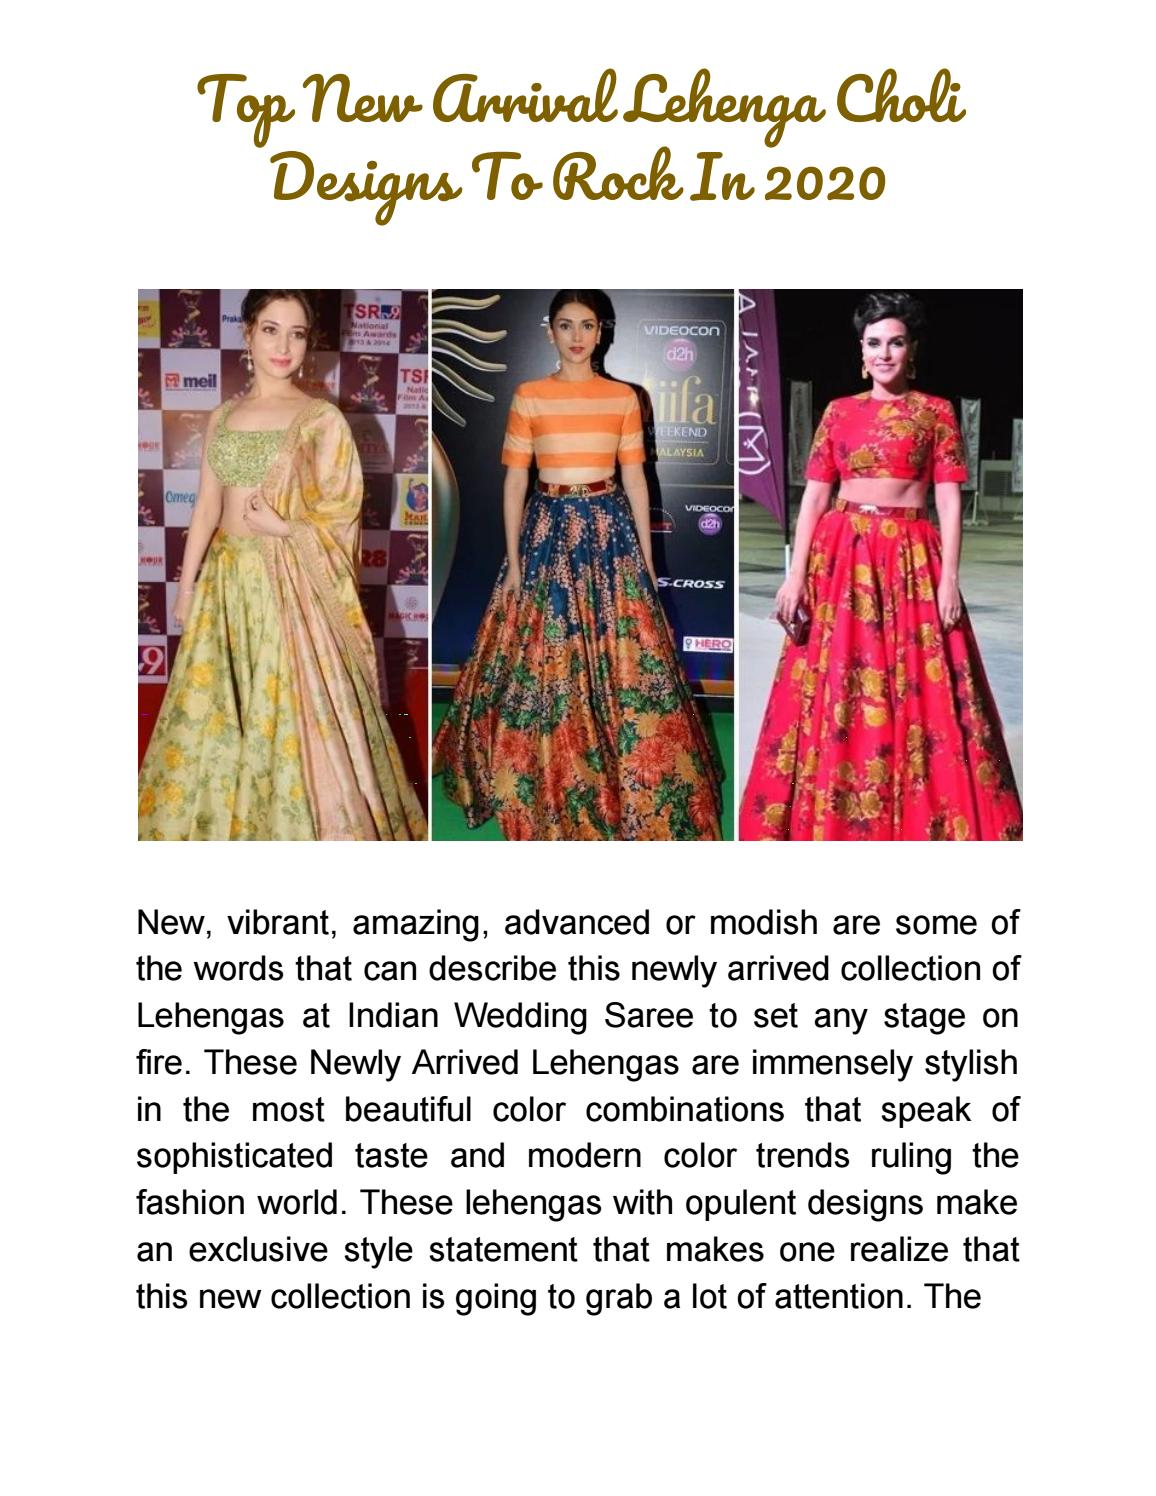 Top New Arrival Lehenga Choli Designs 2020 By Kaitlin Maud Issuu,Living Room Green Interior Design